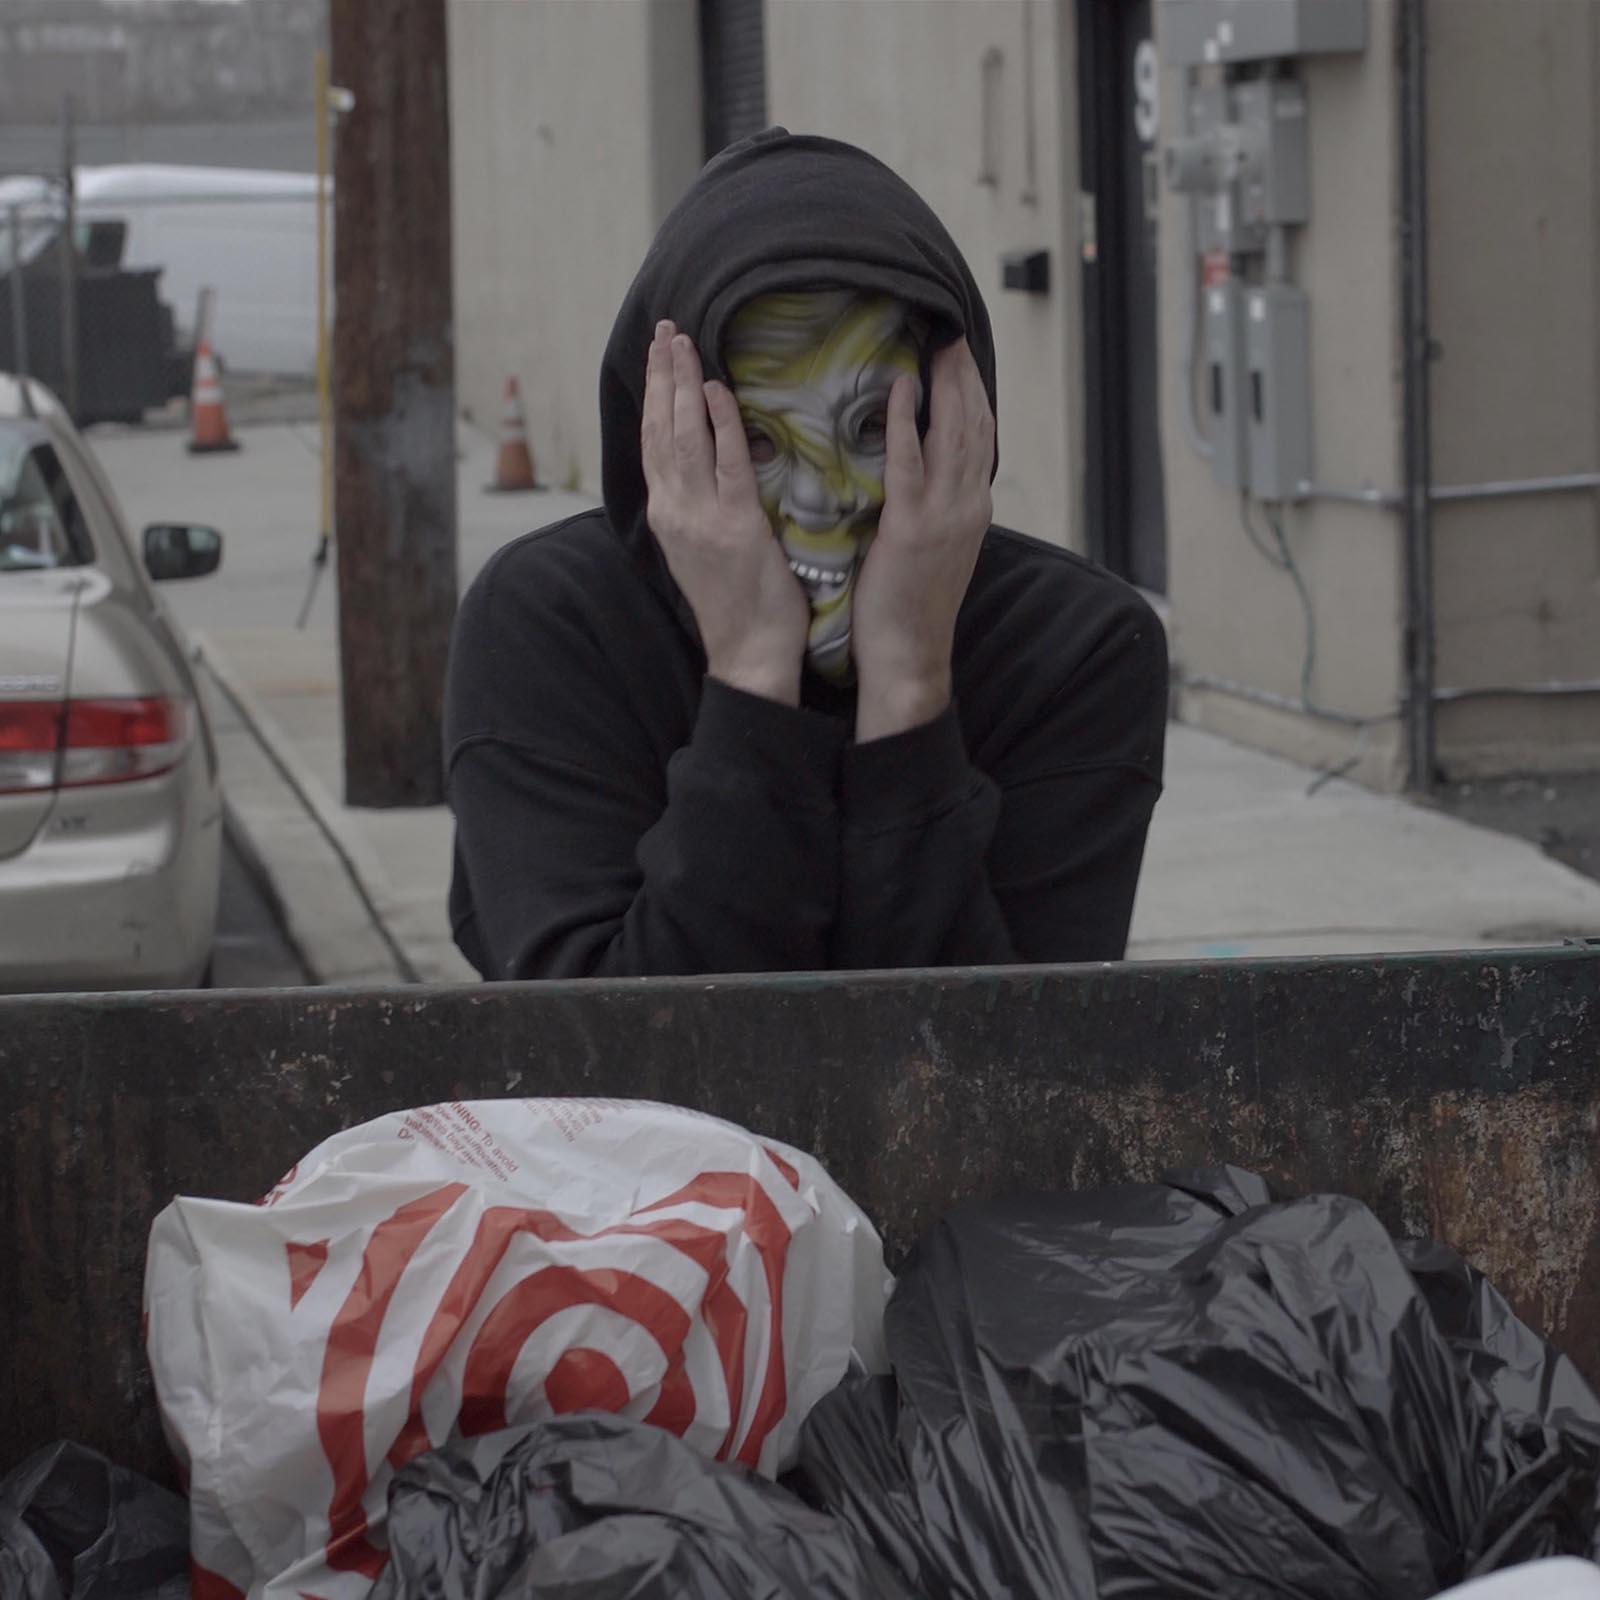 Pyre Fyre Trash Man